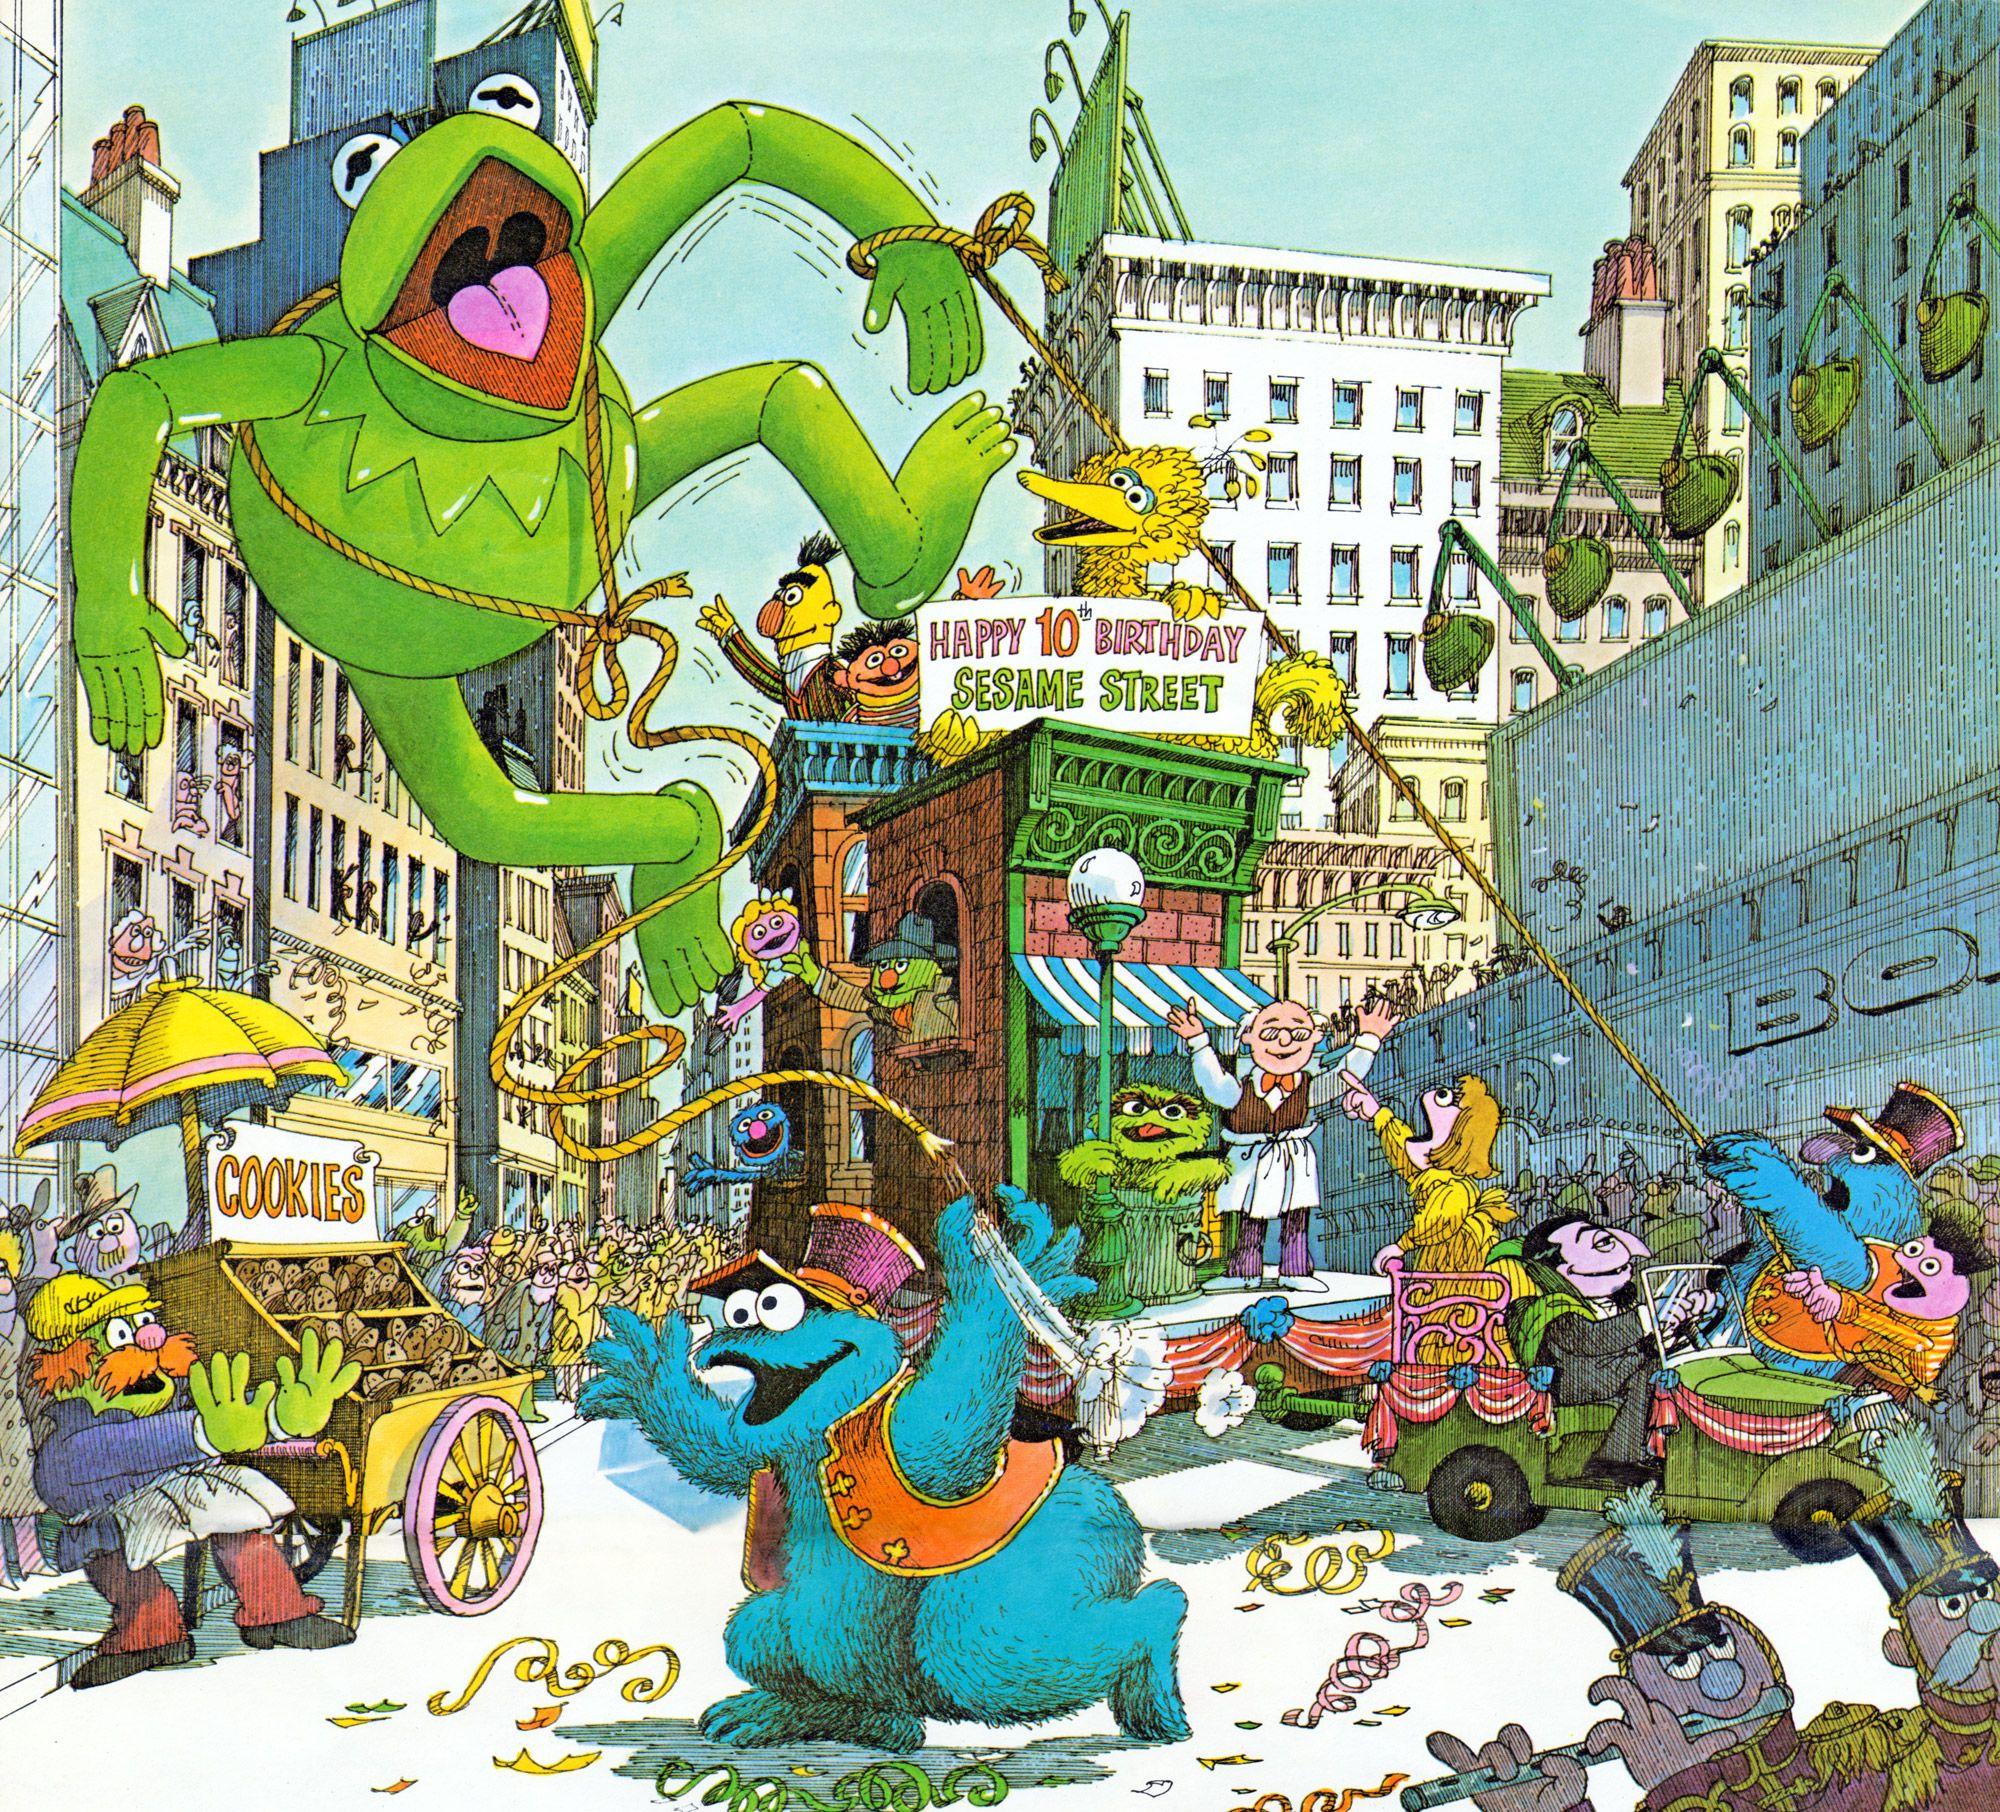 10th Anniversary Sesame Street Drawing Macy S Thanksgiving Day Parade Sesame Street Thanksgiving Day Parade Macy S Thanksgiving Day Parade